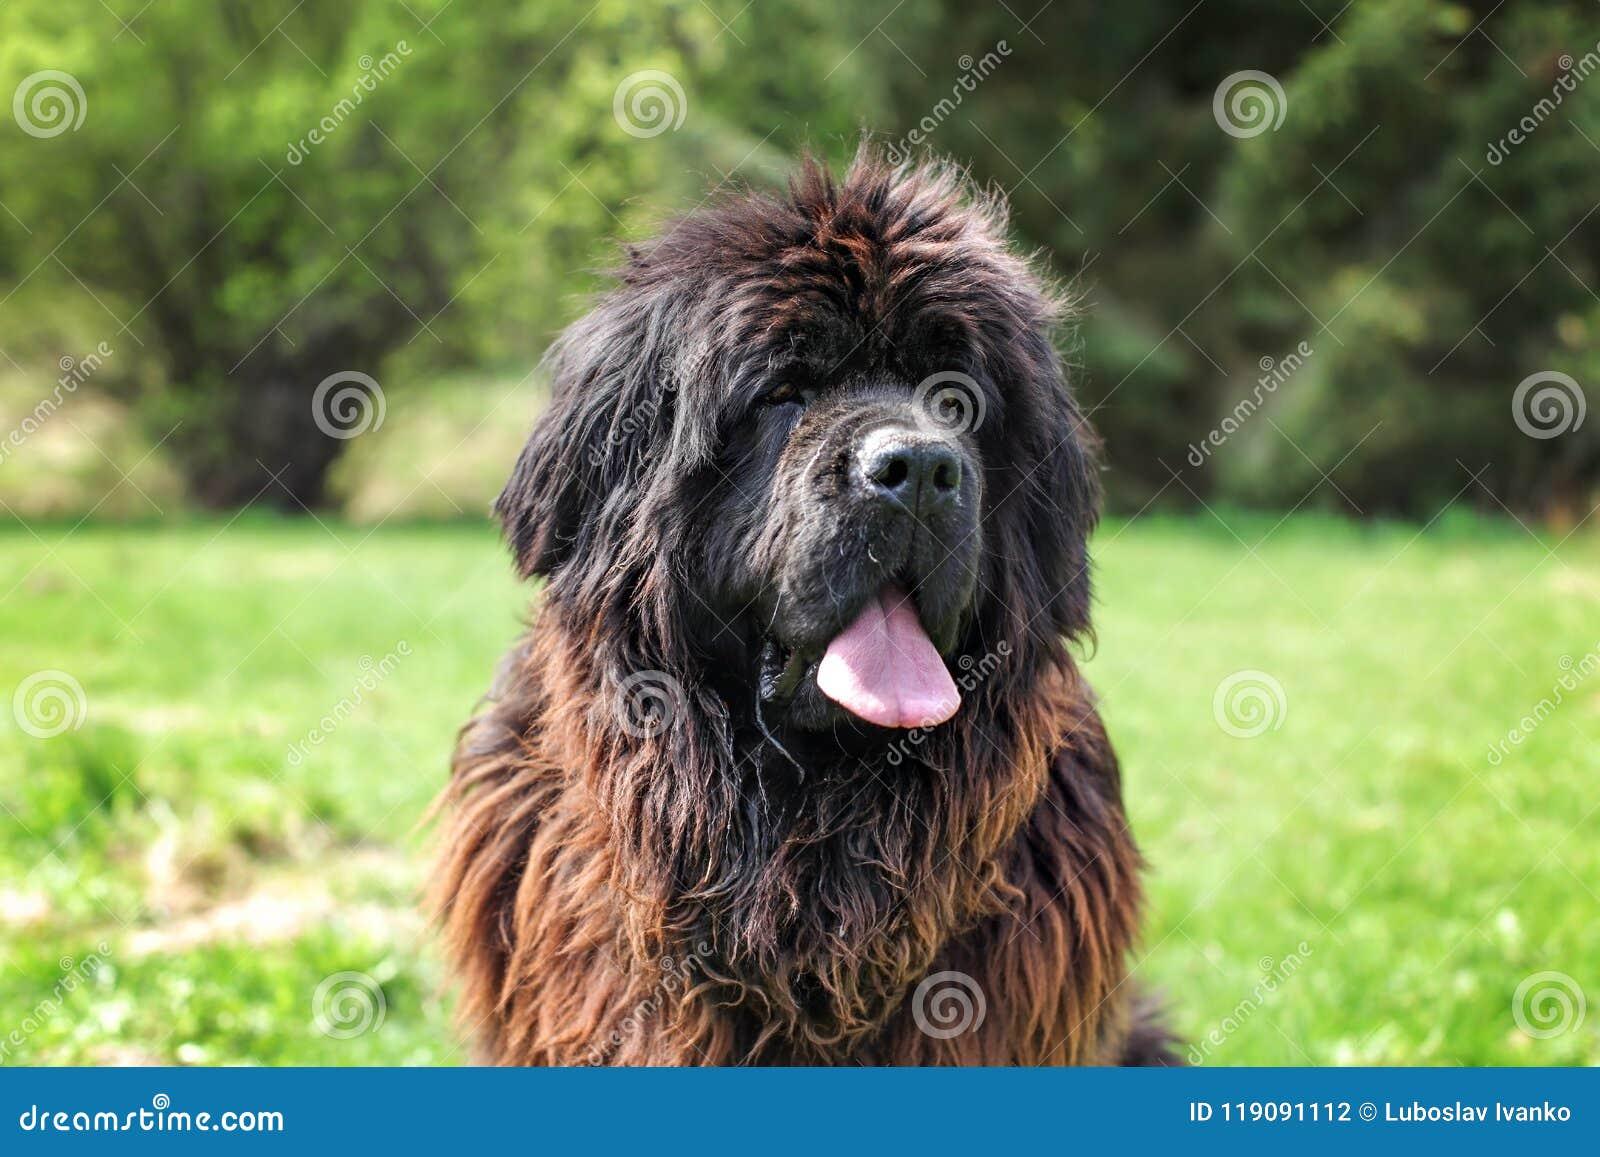 Huge newfoundland dog, with green park in background.